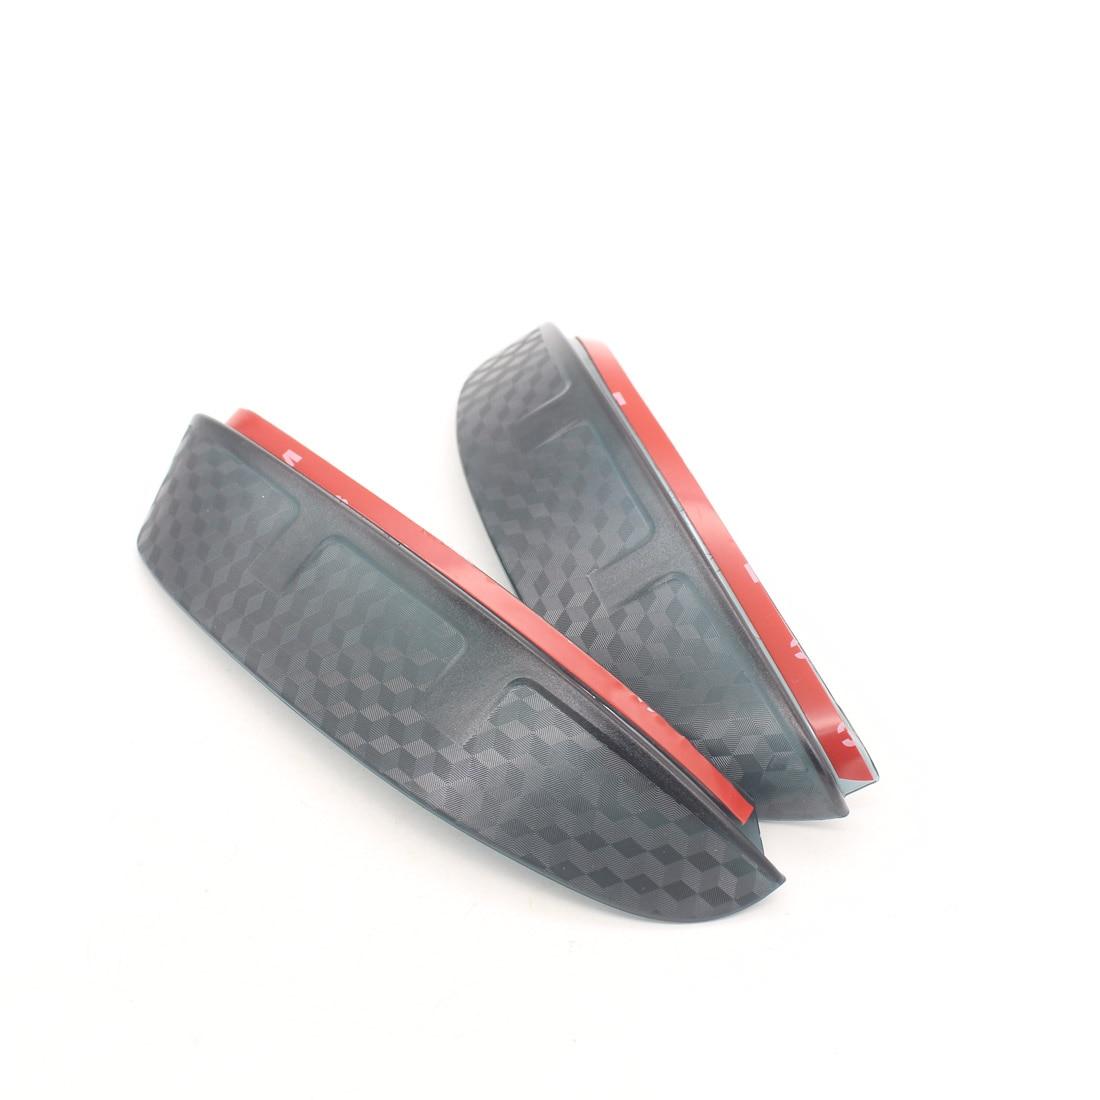 Dongzhen 2X For Skoda Octavia 2013 Auto Car Carbon Fiber Rearview Mirror Rain Eyebrow Accessories Car Styling Car-cover